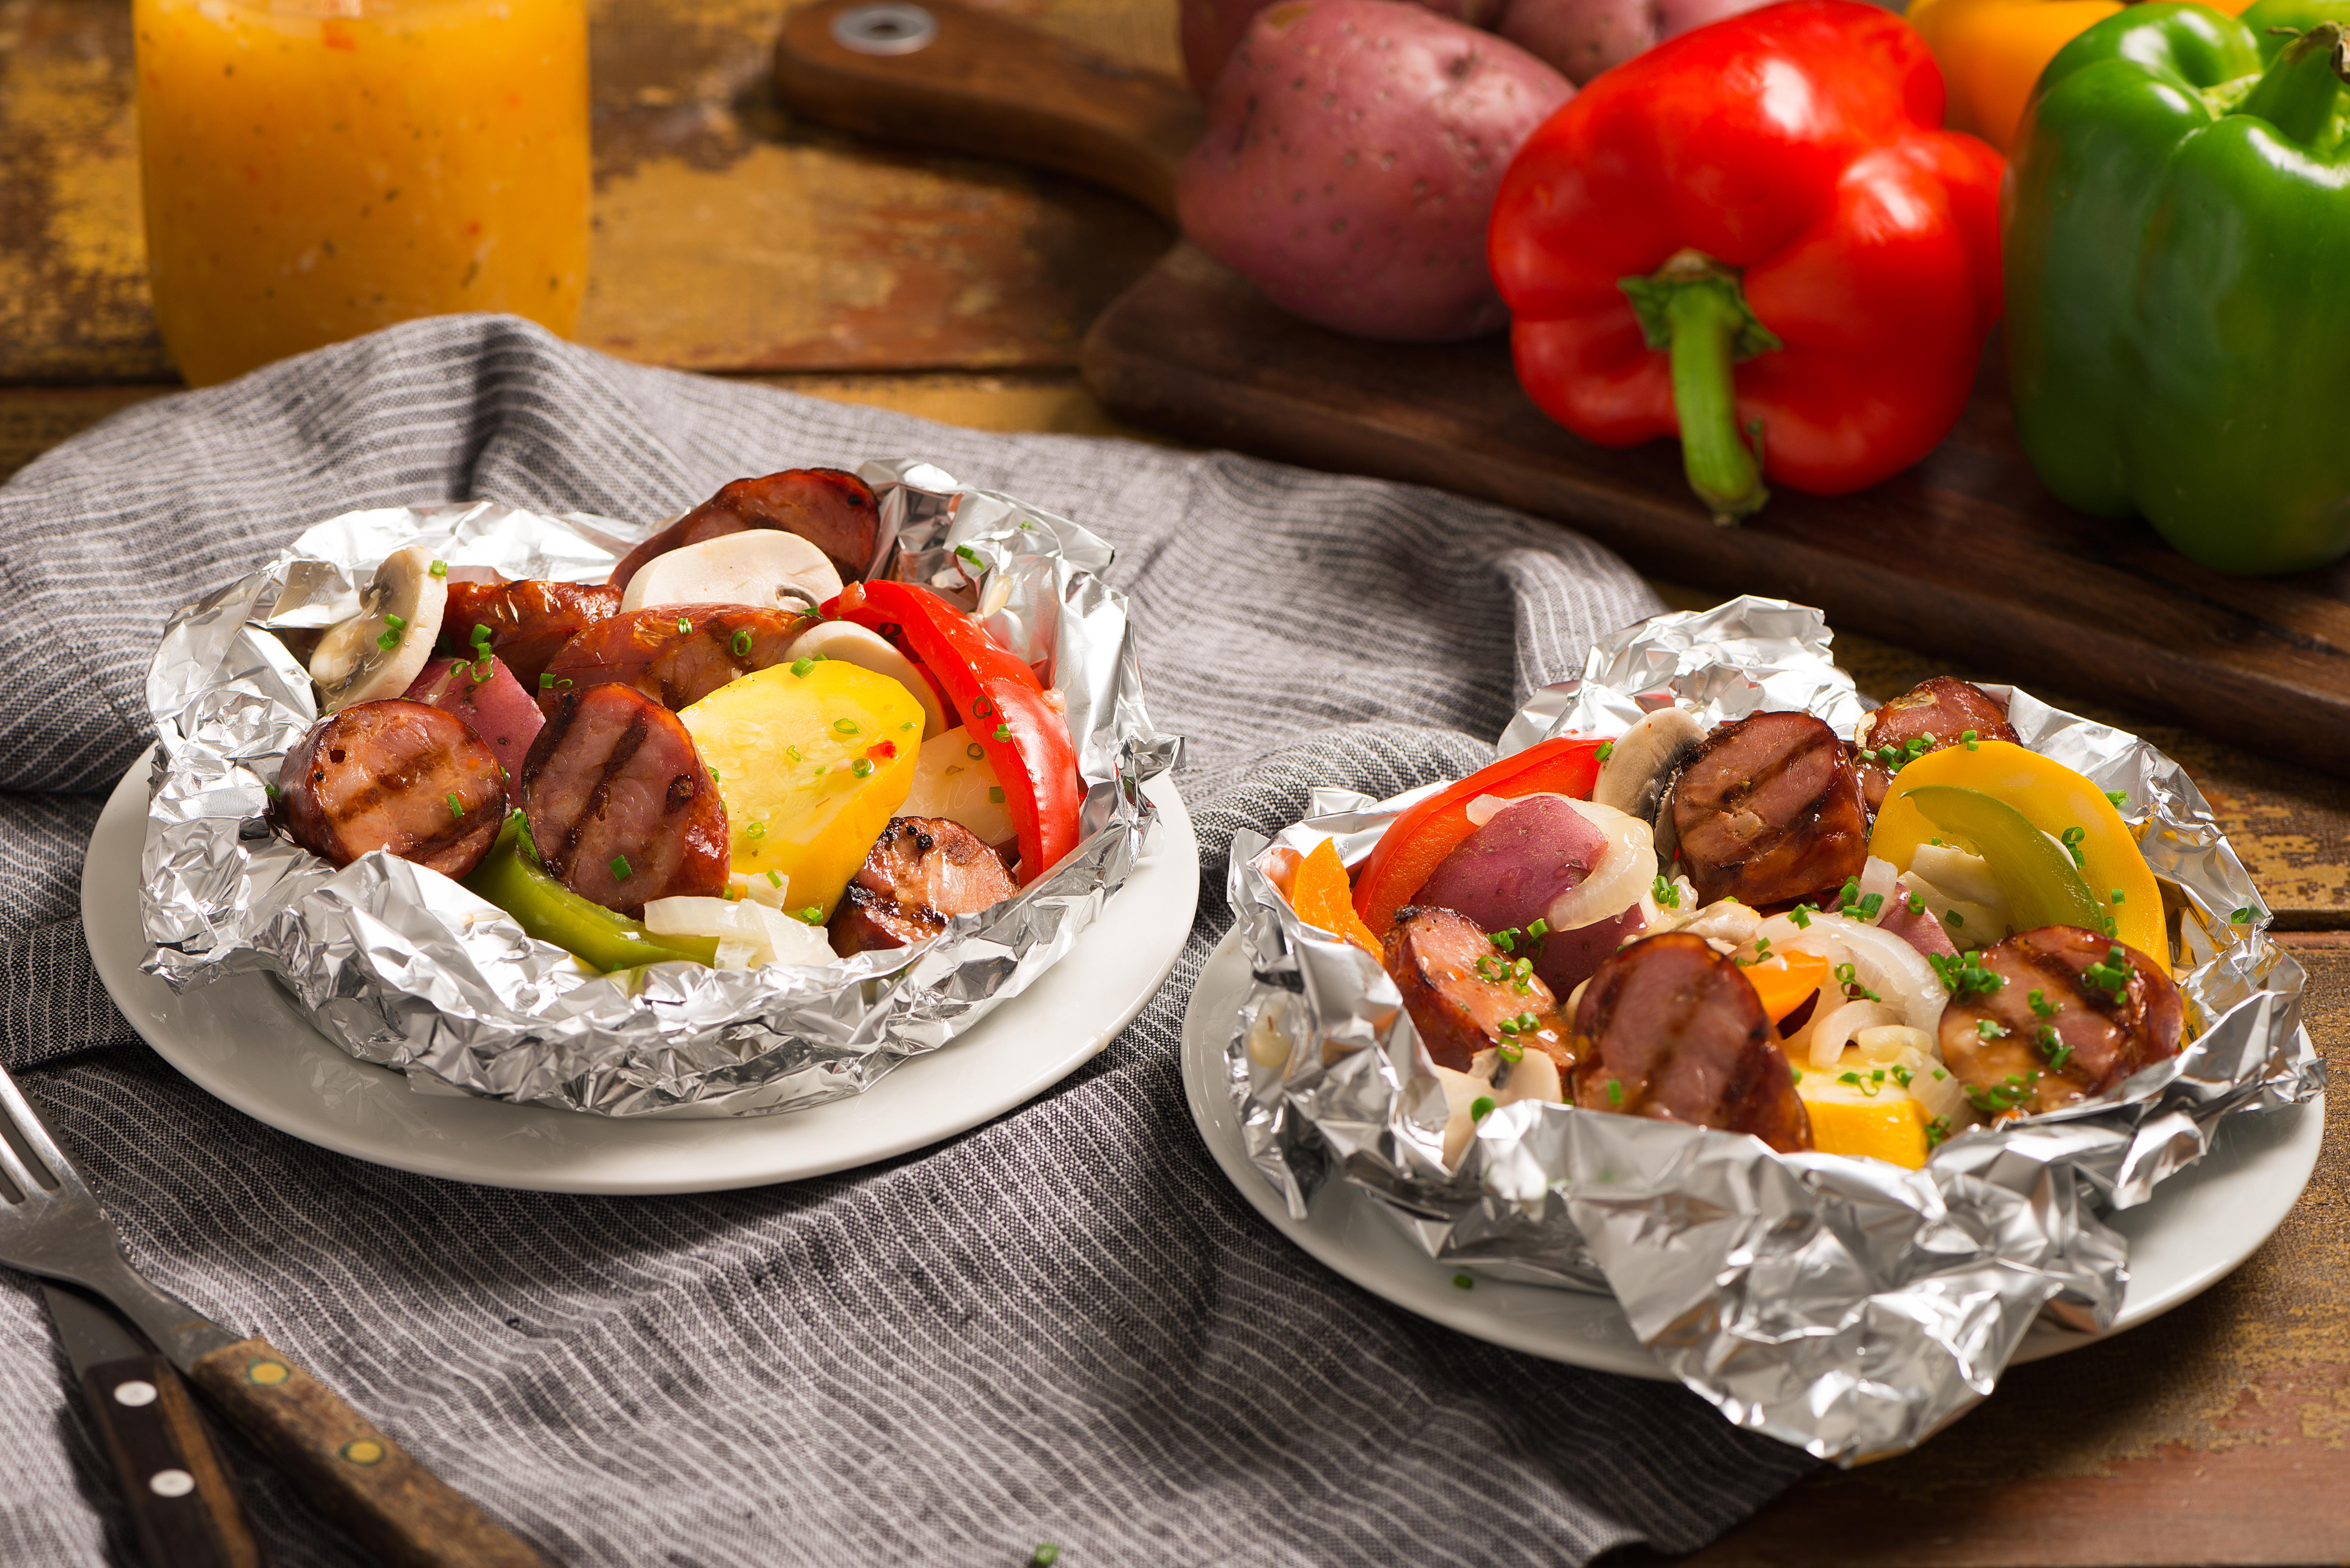 Grilled Kielbasa and Mixed Veggie Packs